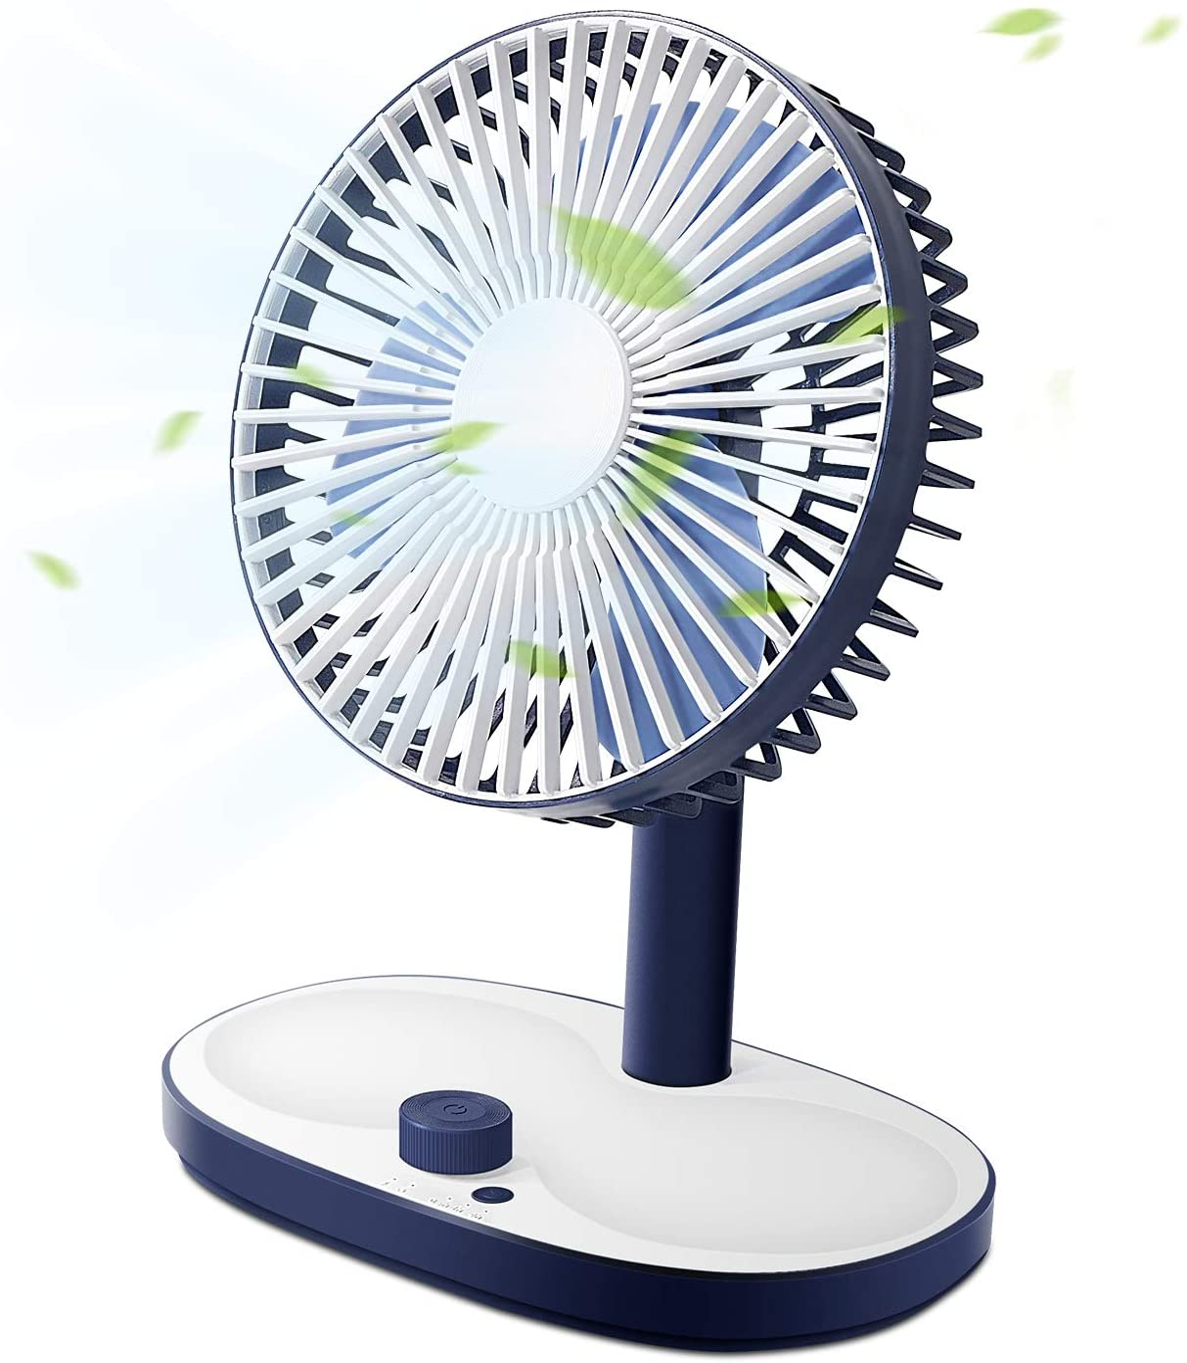 SmartDevil Desktop Fan, Personal Desk Fan With Storage Function, Built-in 2600 mAh Rechargeable Battery, Smart Timing Function, Stepless Speed Regulation, Small Fan For Home, Office, Bedroom,Blue